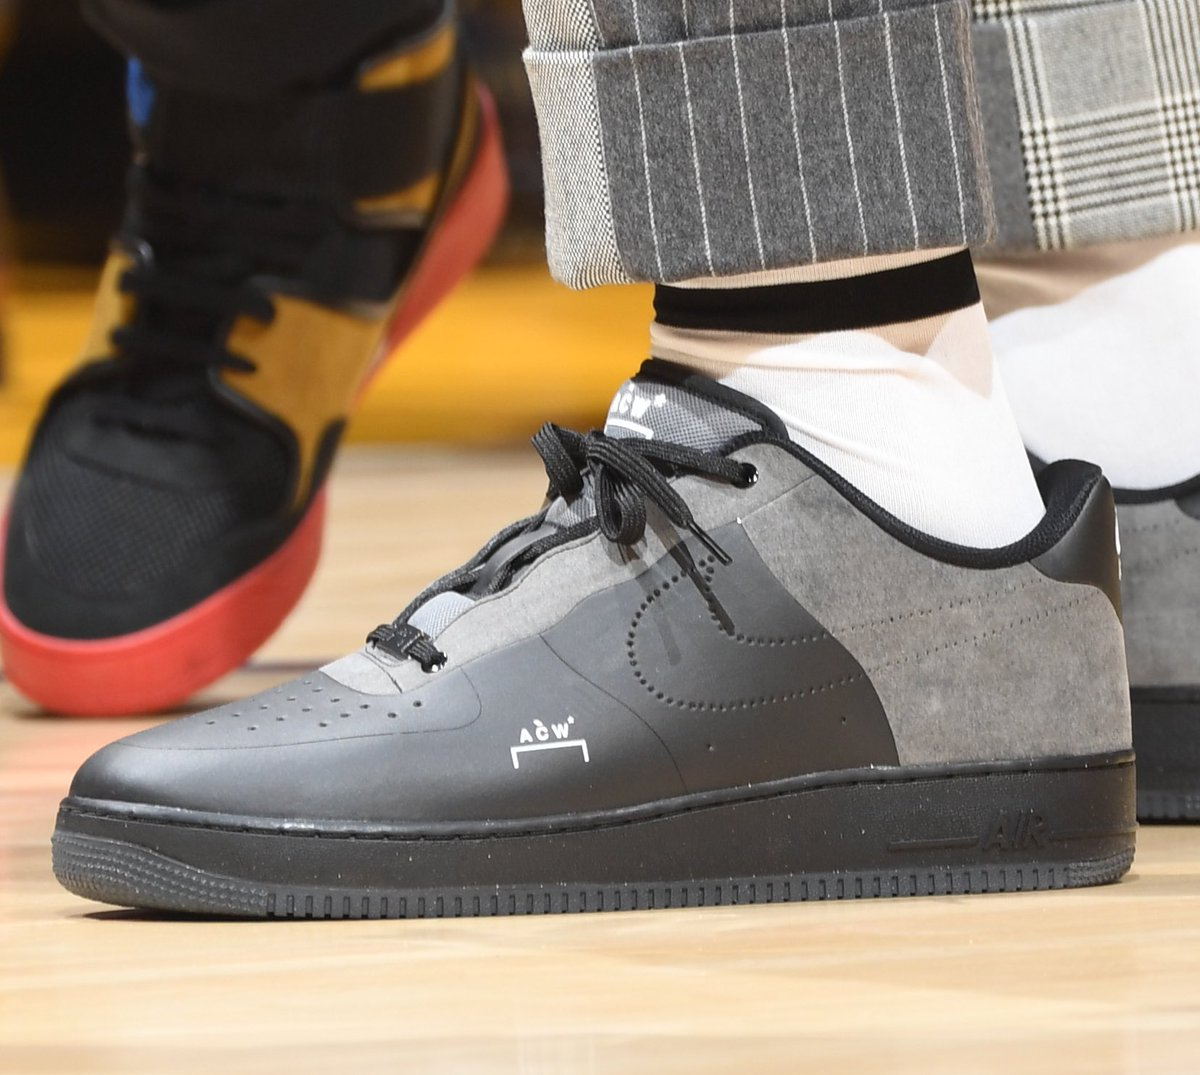 ACW x Nike Air Force One Low AF1